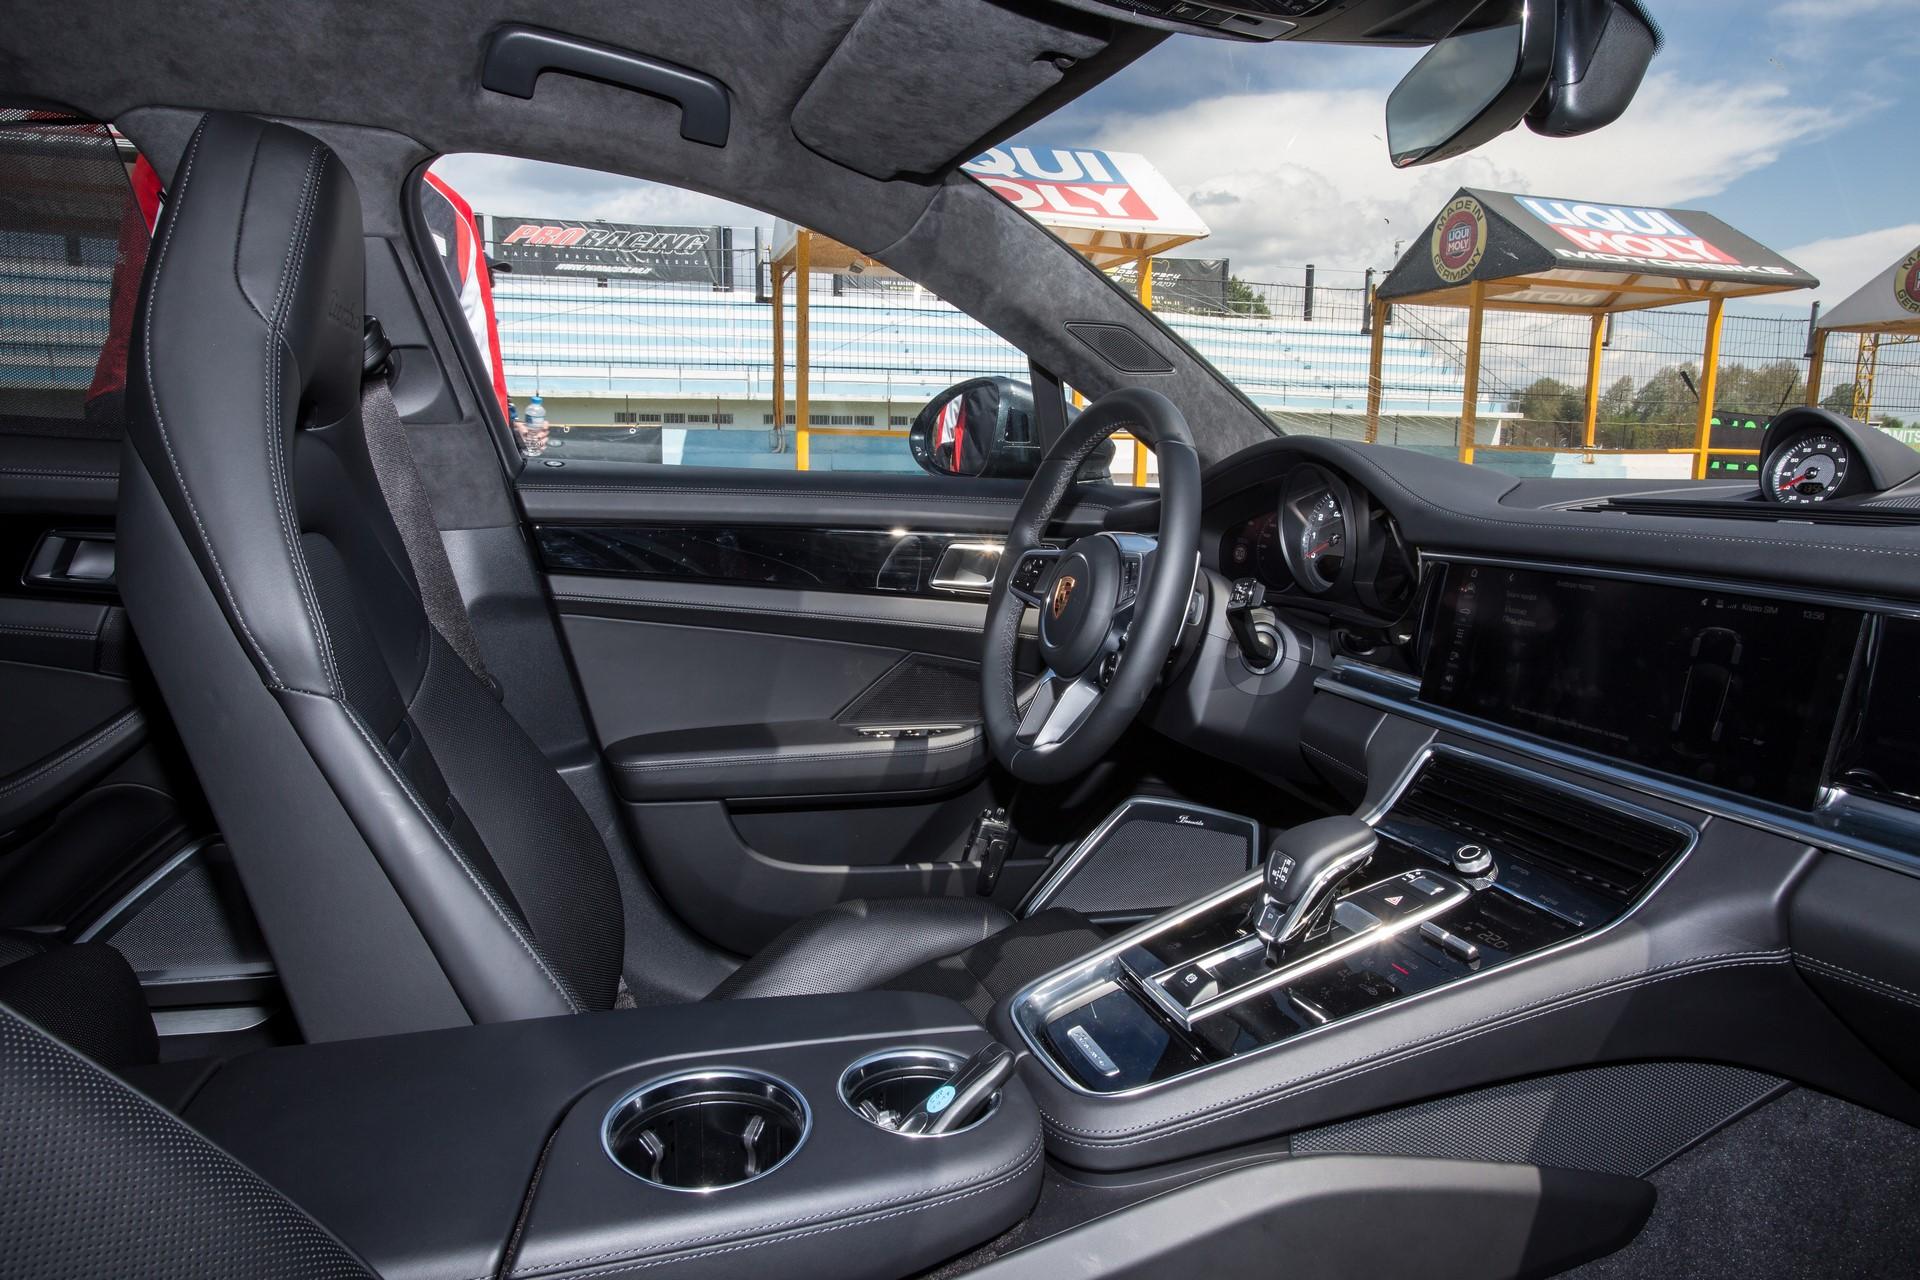 Porsche Driving Experience 2017 Serres (17)